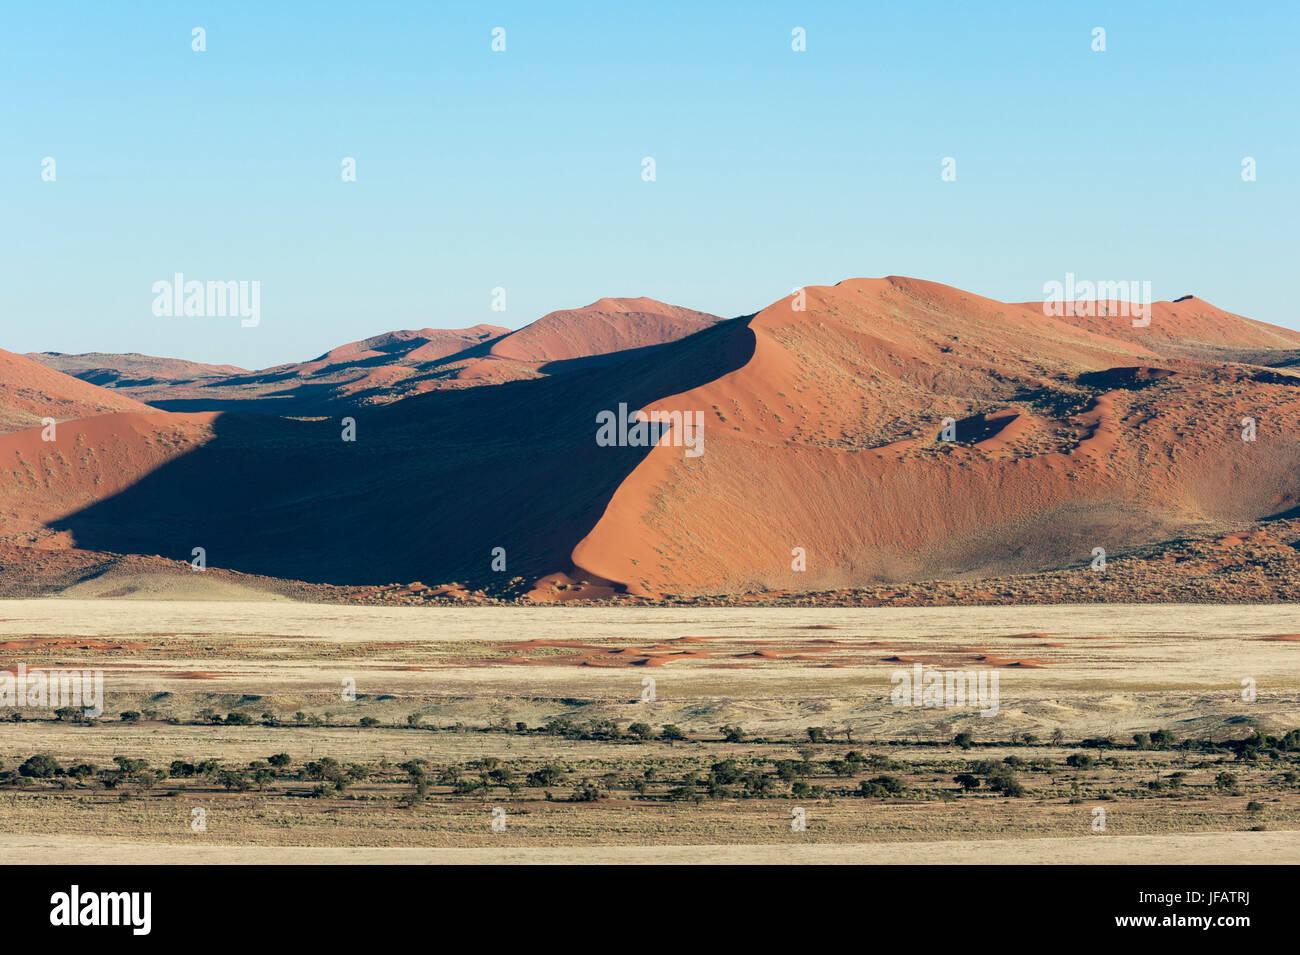 Aerial view, Namib Naukluft Park, Namib Desert, Namibia. - Stock Image